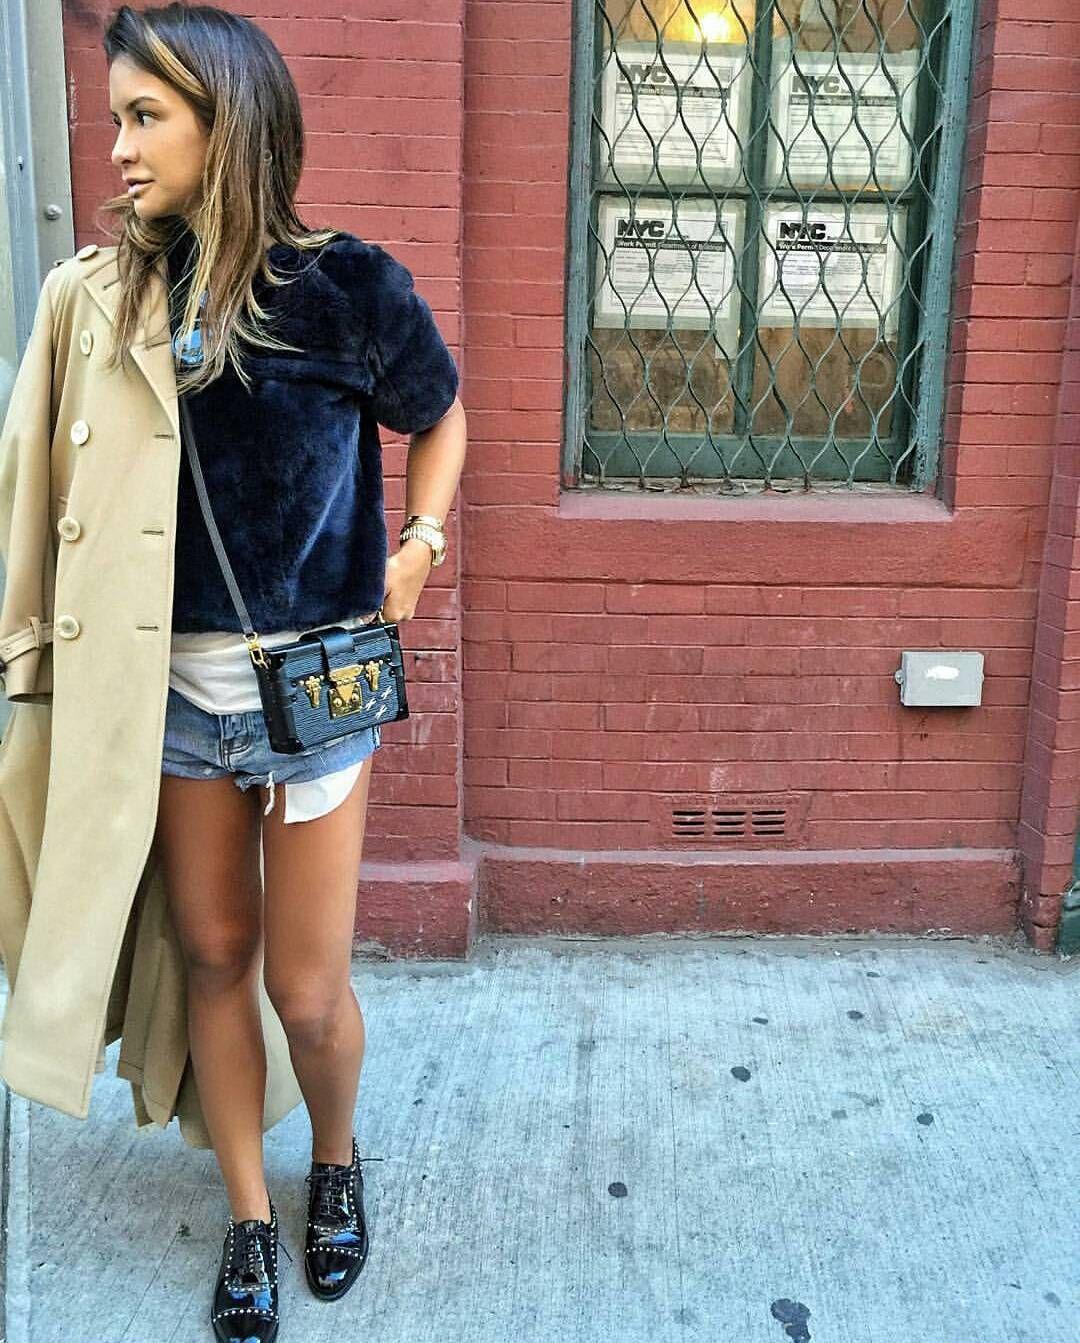 fashion_viadi Insta fashion, Fashion, Street style